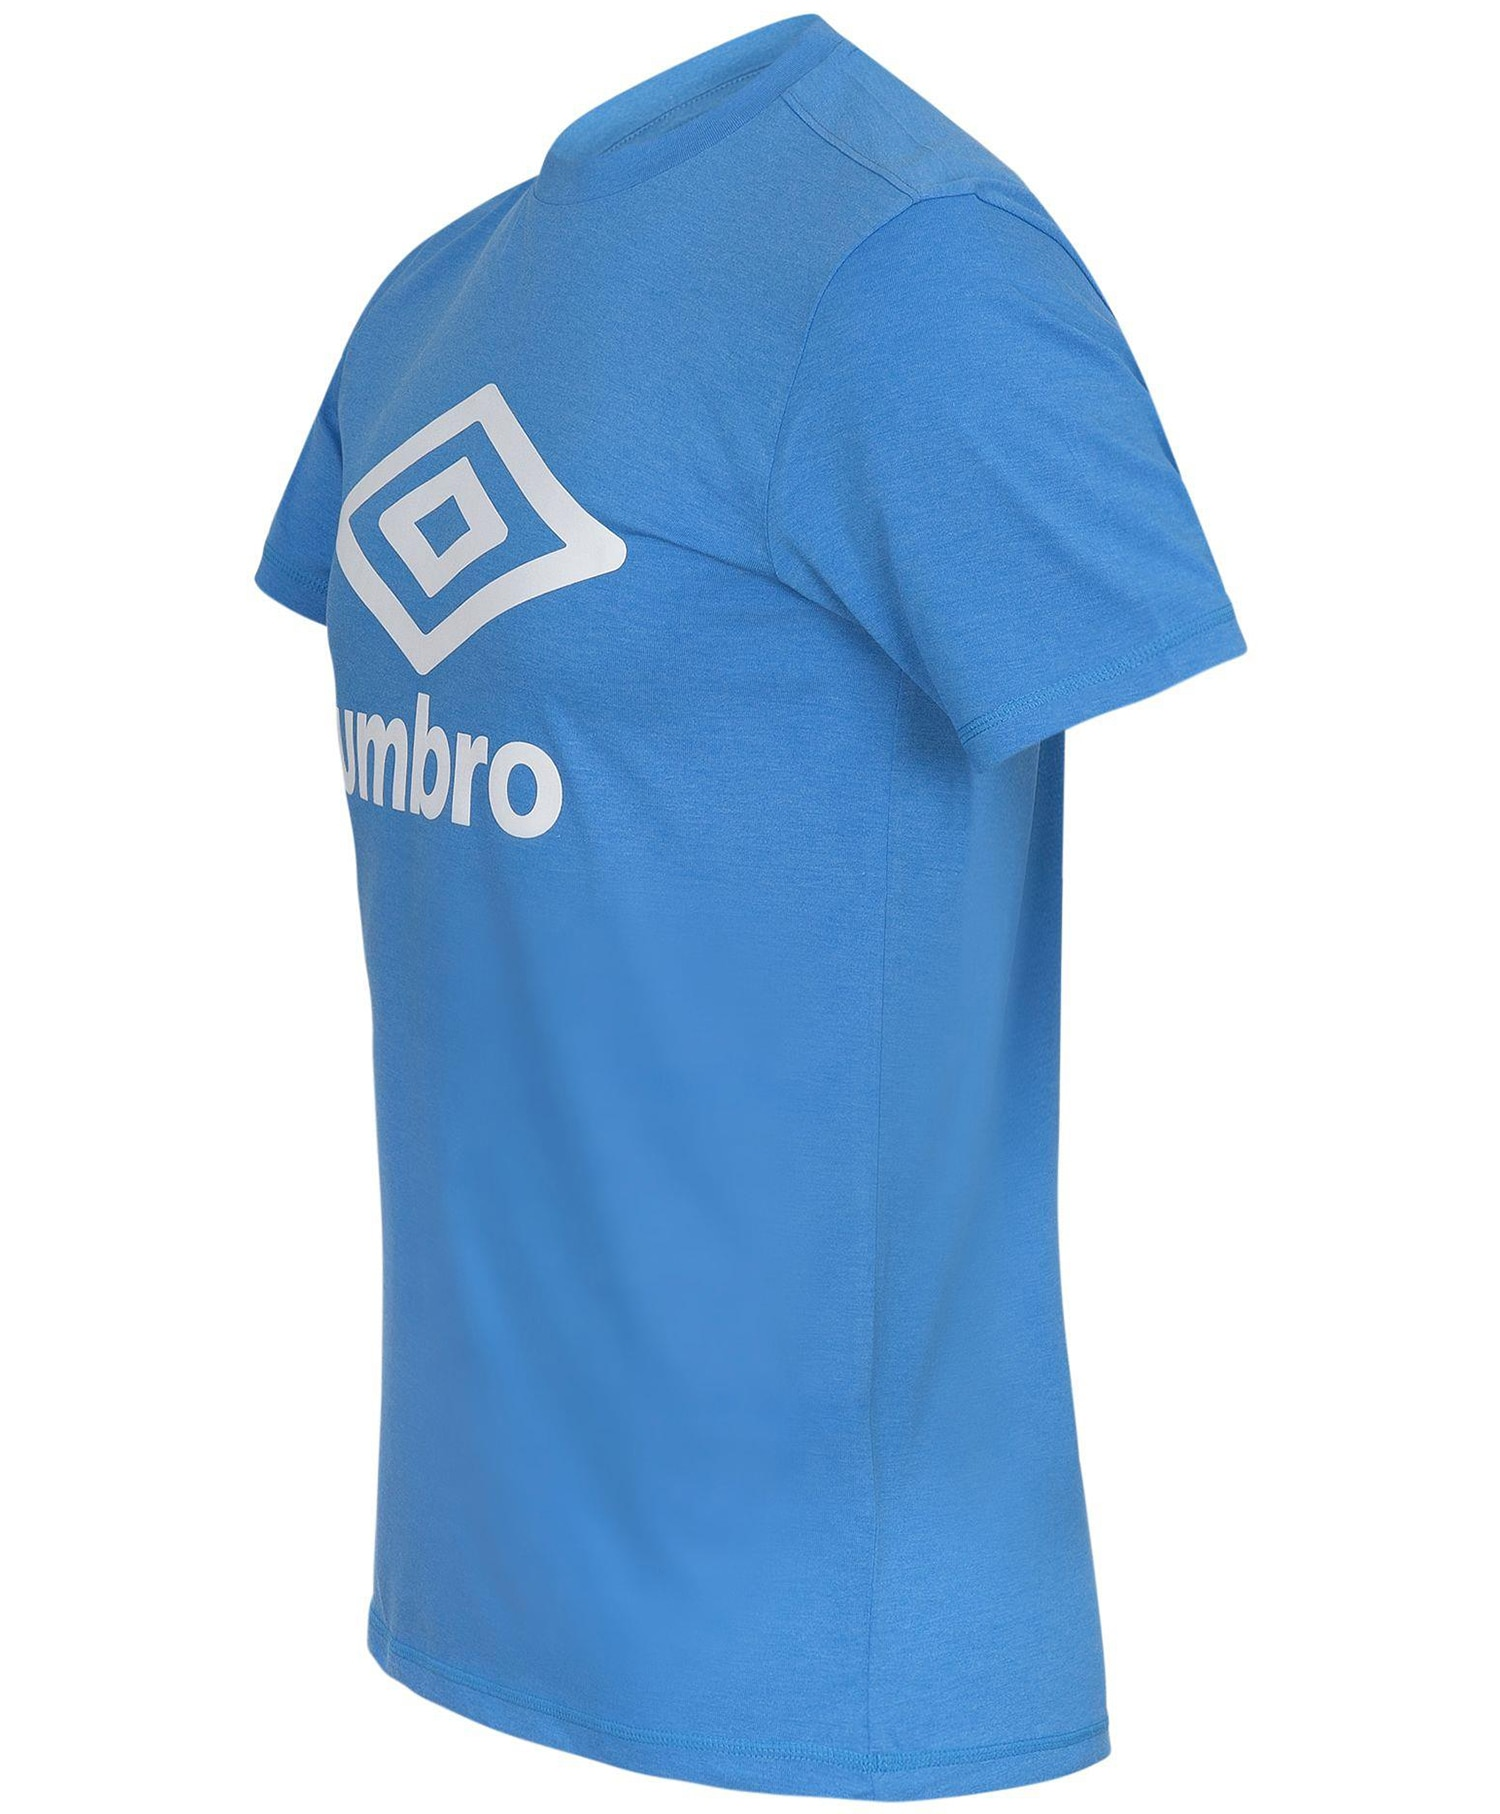 Umbro Large Logo tee